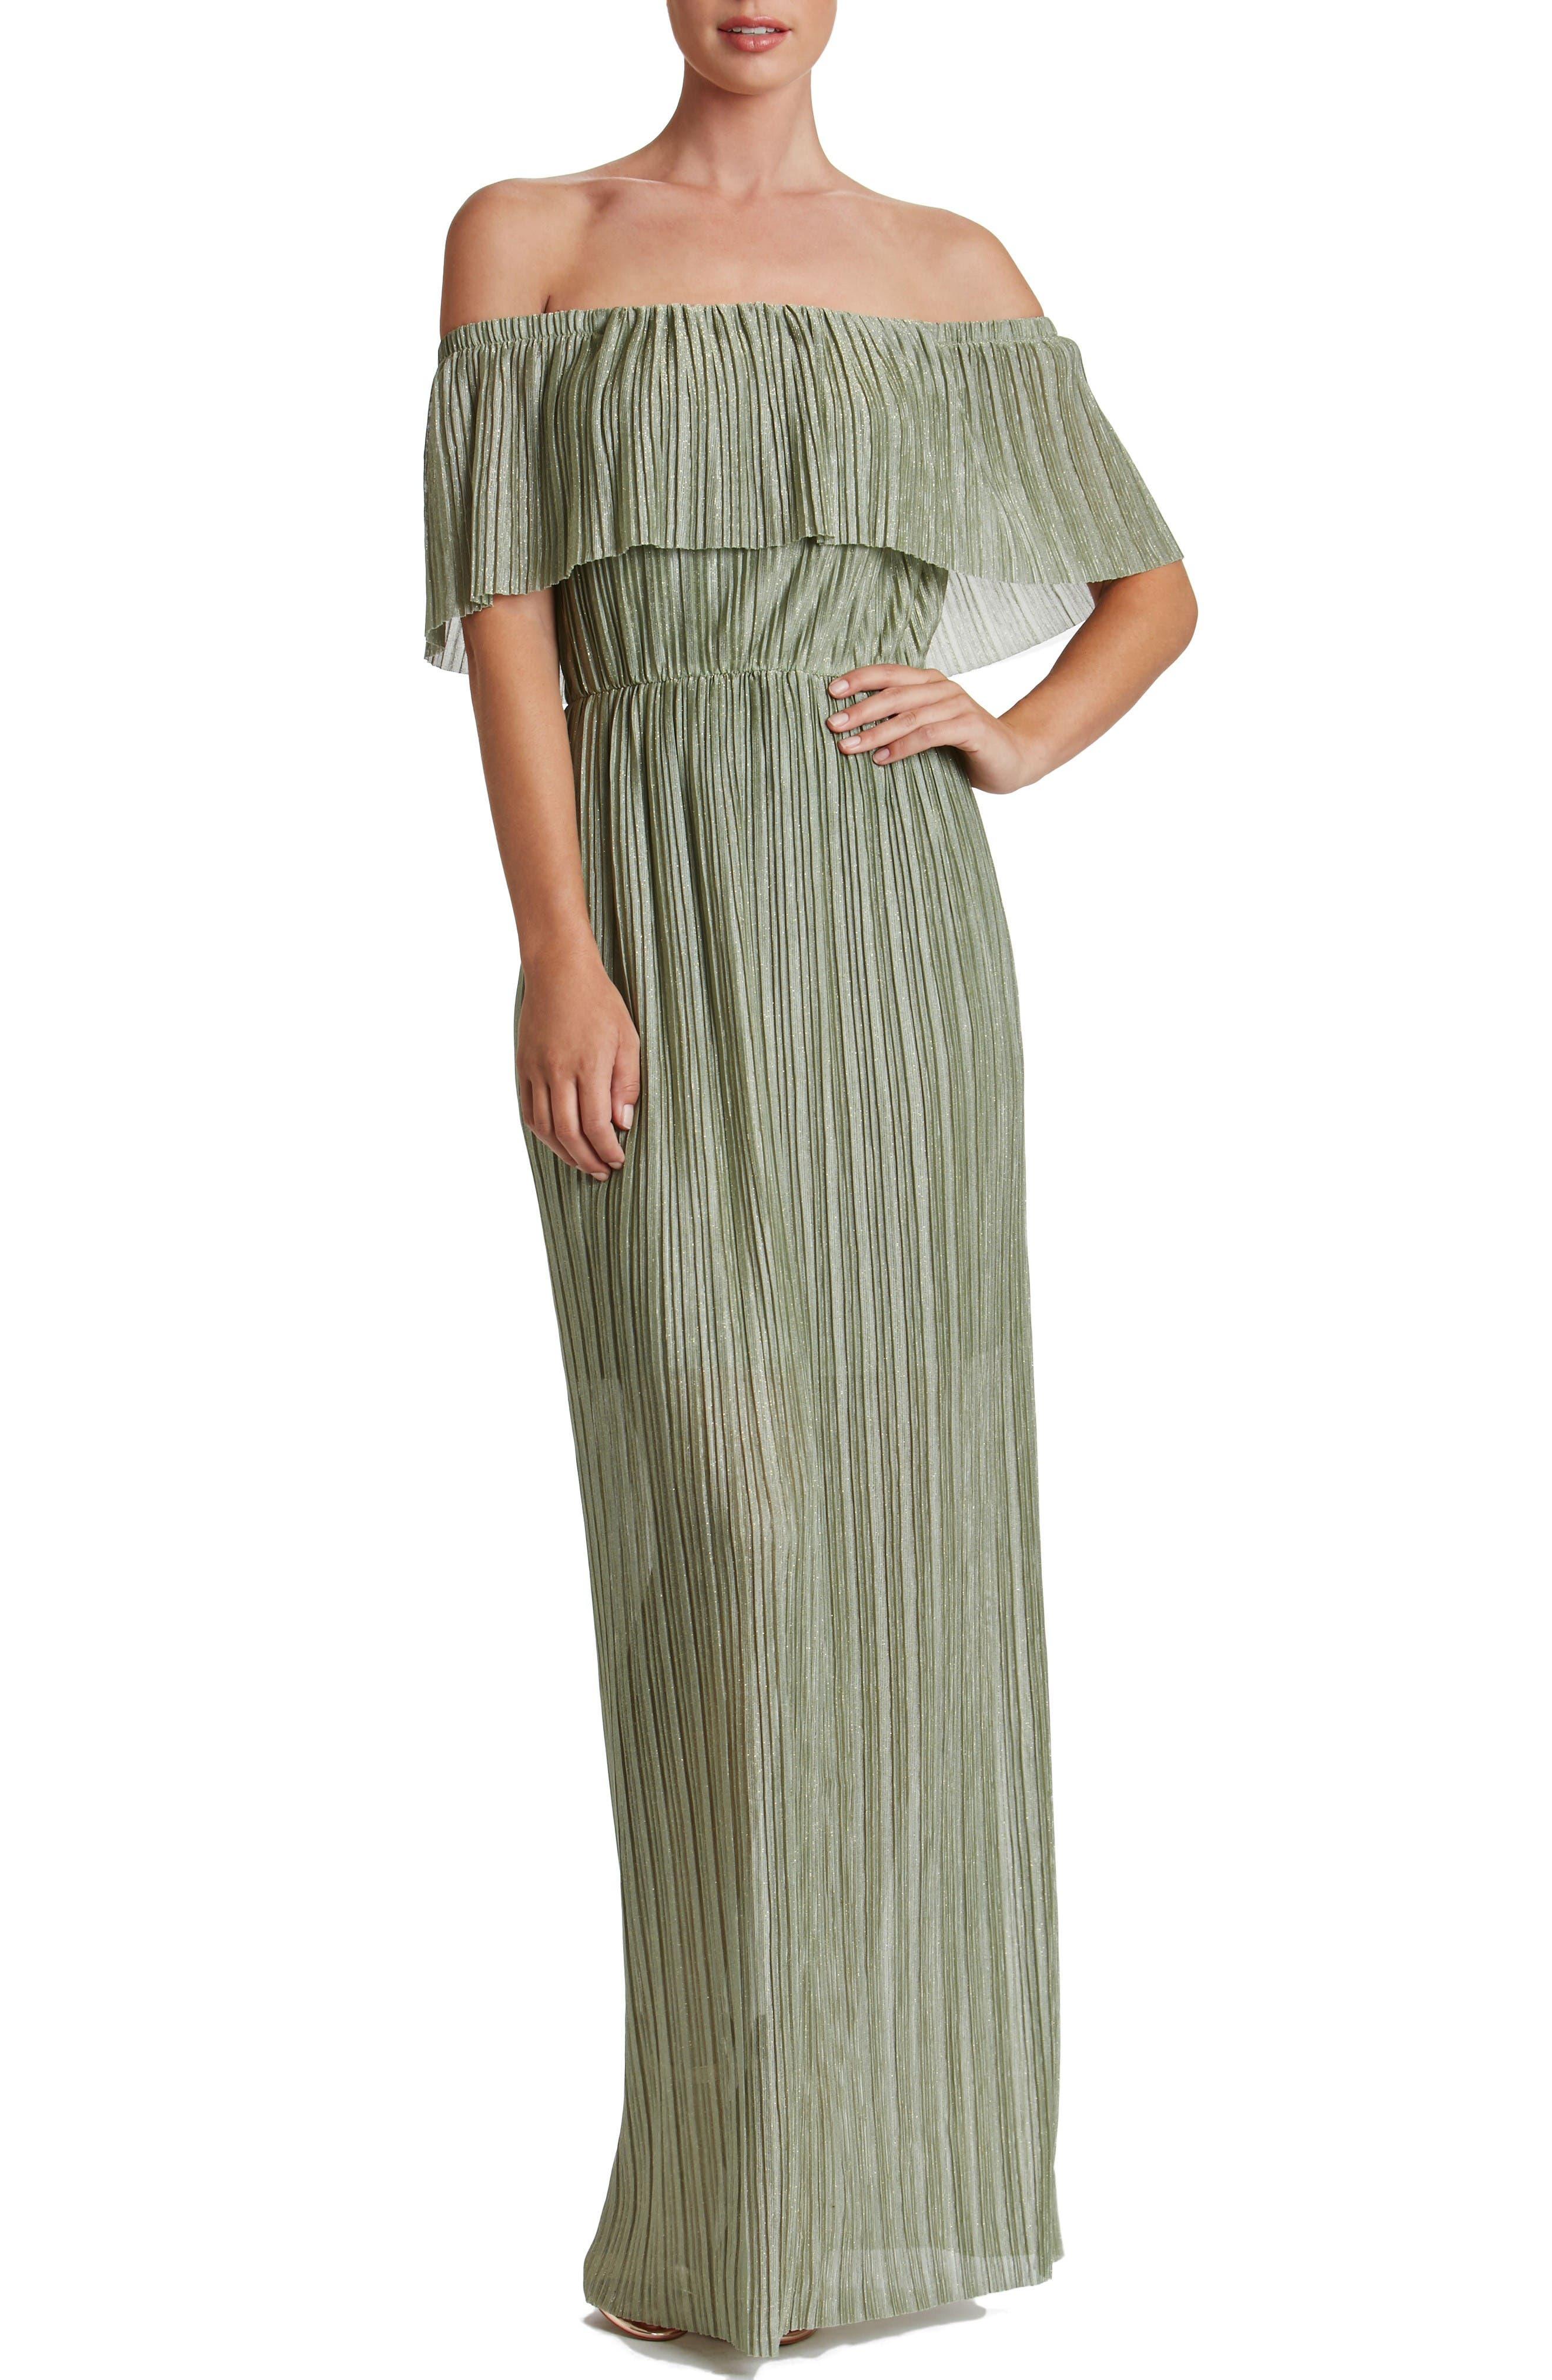 Alternate Image 1 Selected - Dress the Population Athena Maxi Dress